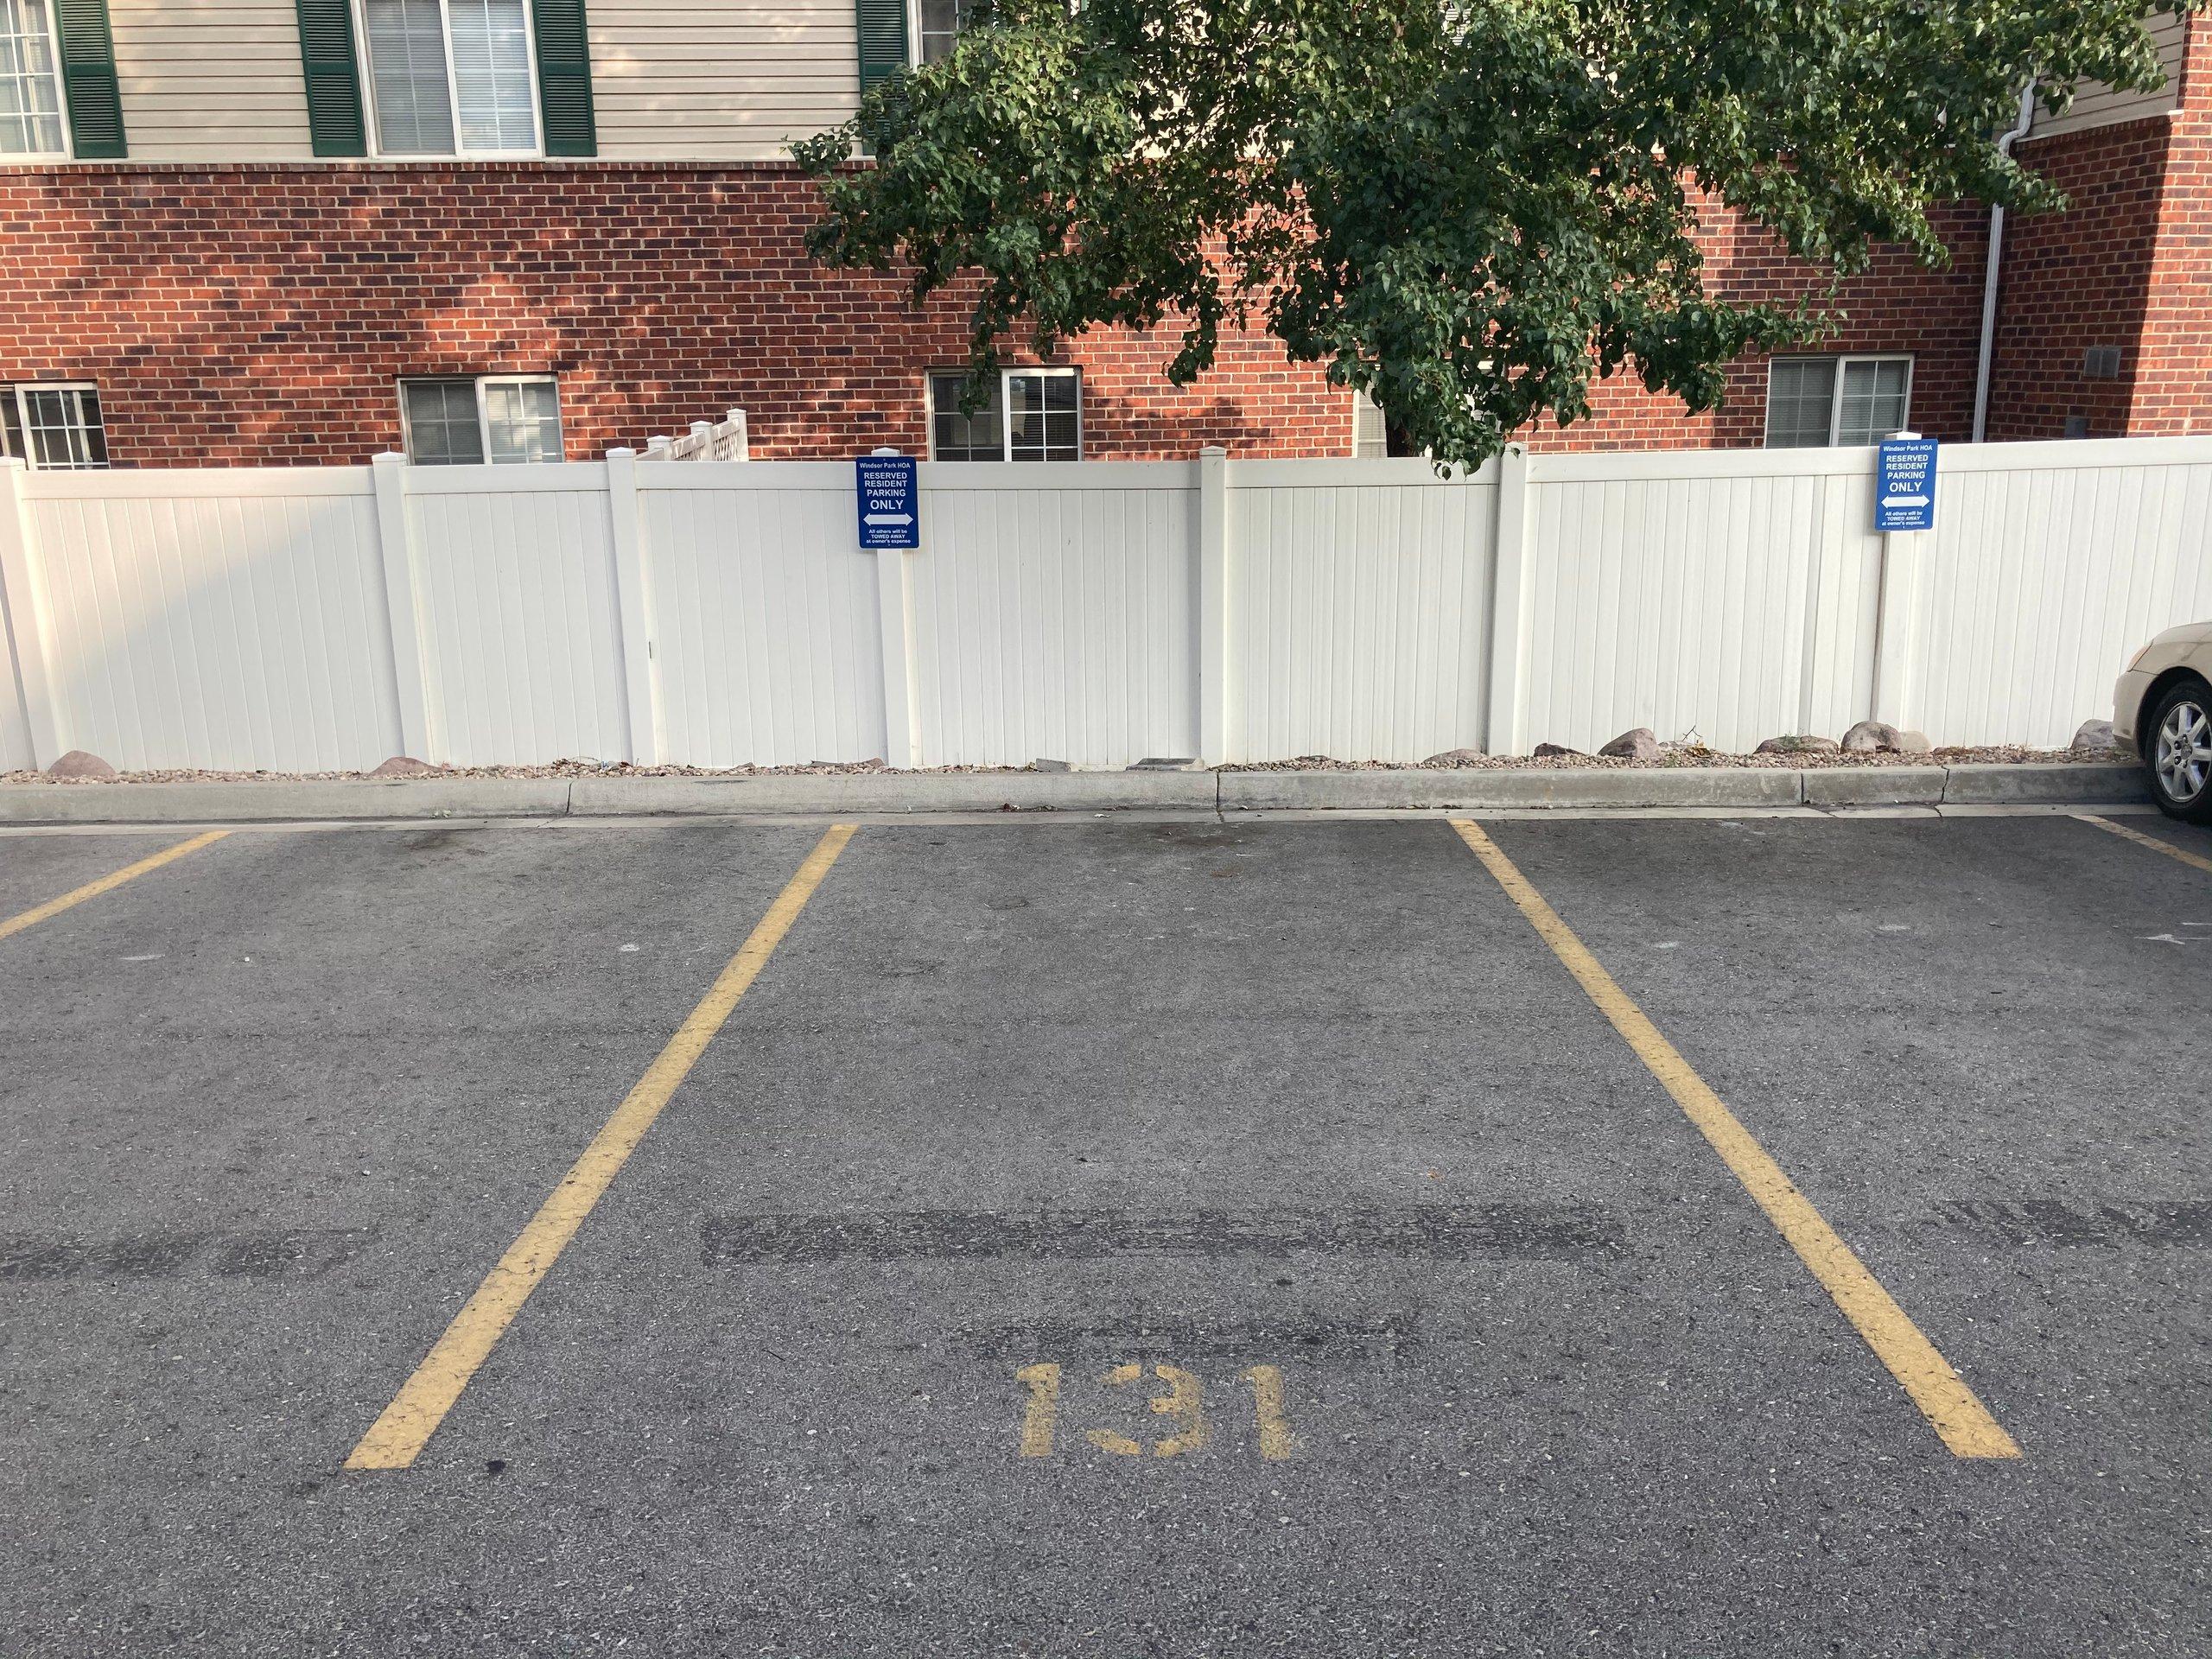 18x9 Parking Lot self storage unit